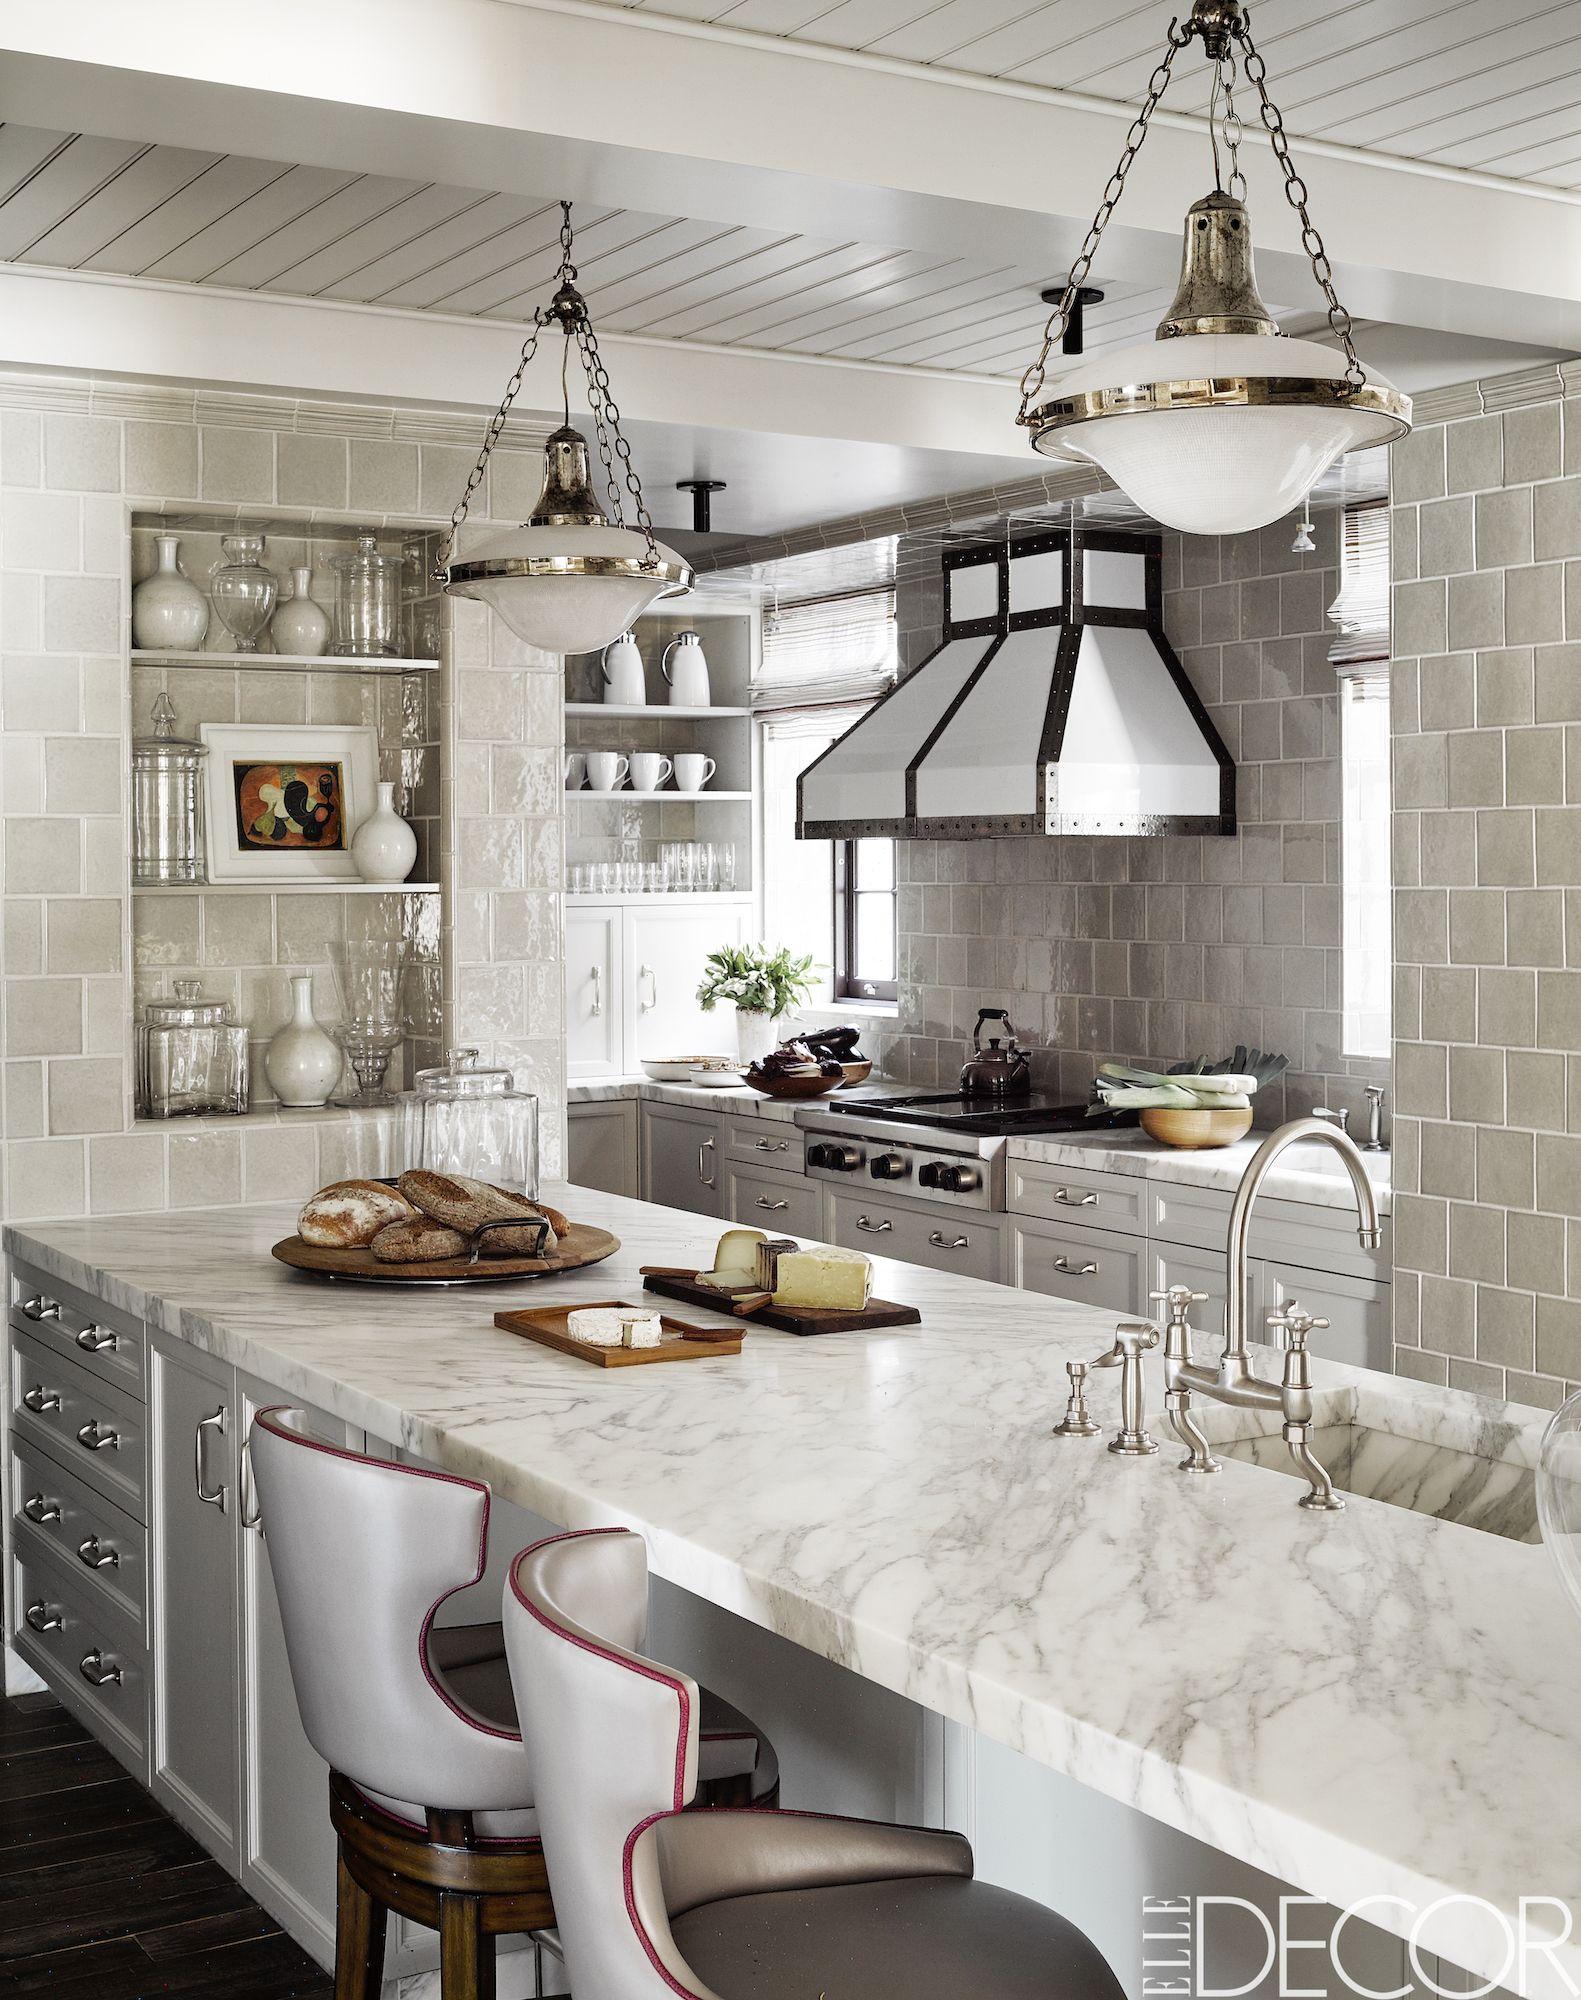 kitchen tile designs gas stoves 20 gorgeous backsplashes best ideas